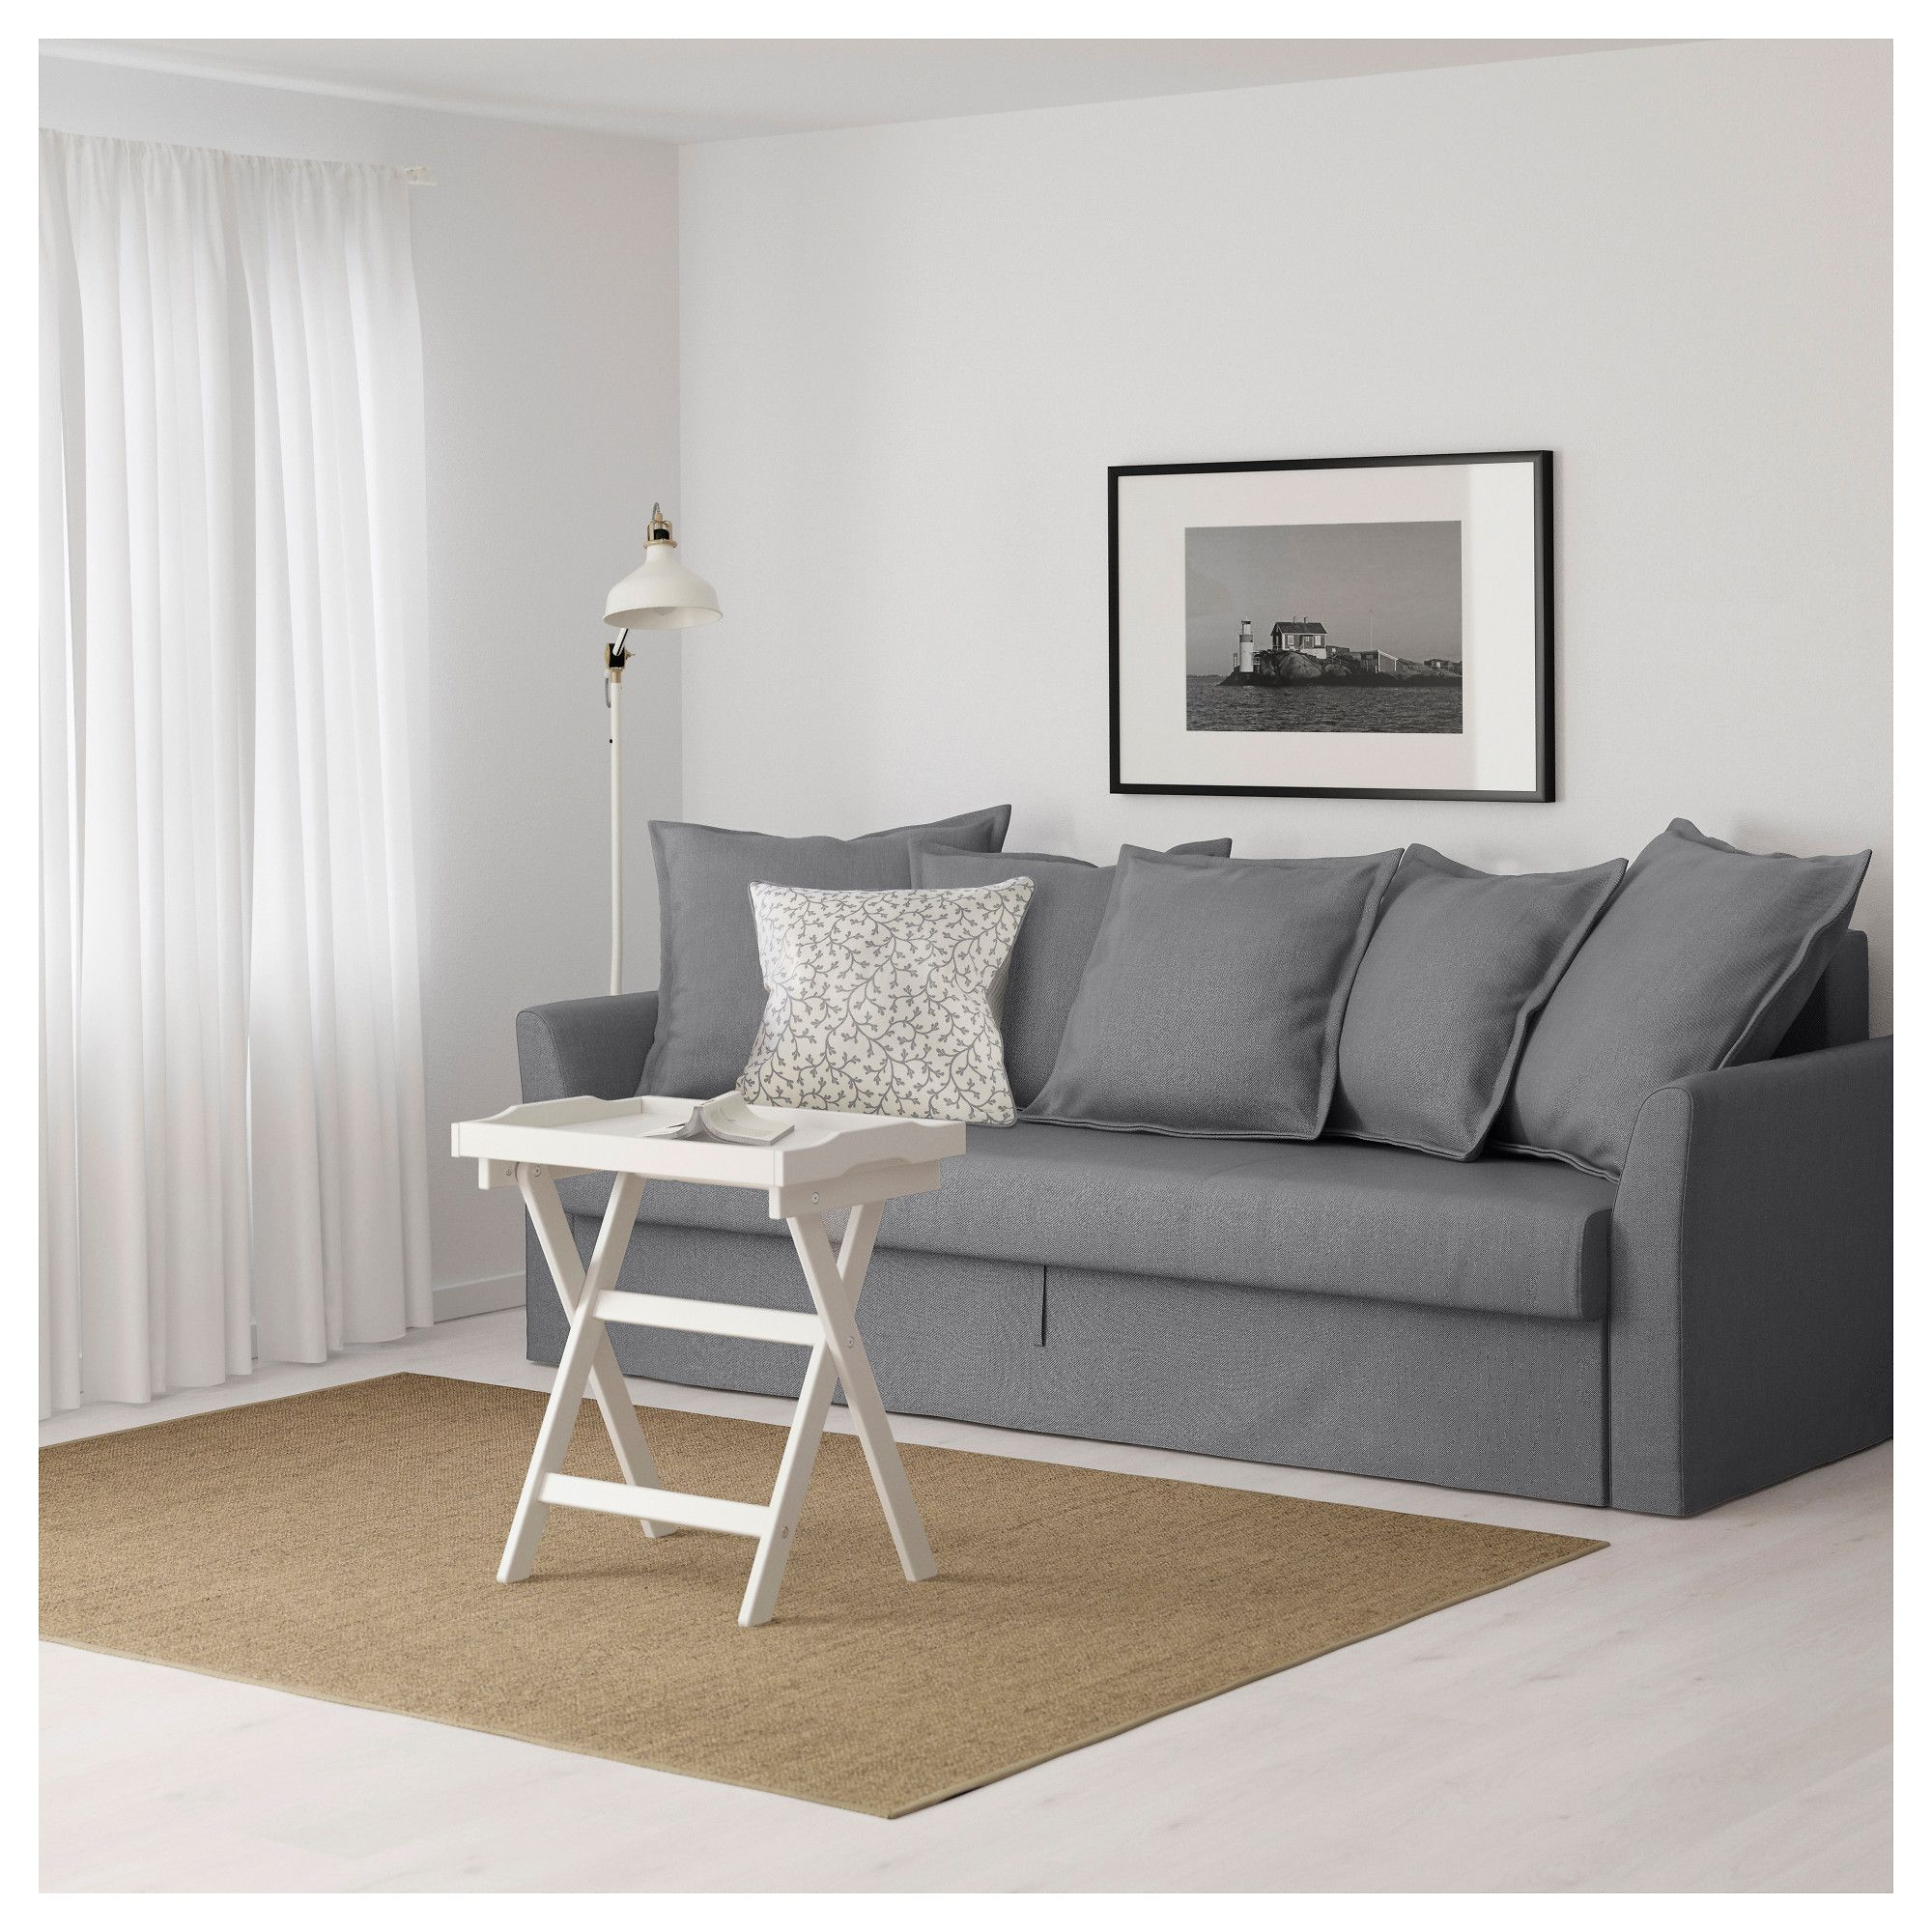 IKEA HOLMSUND Sofabed Nordvalla medium gray Sofa bed